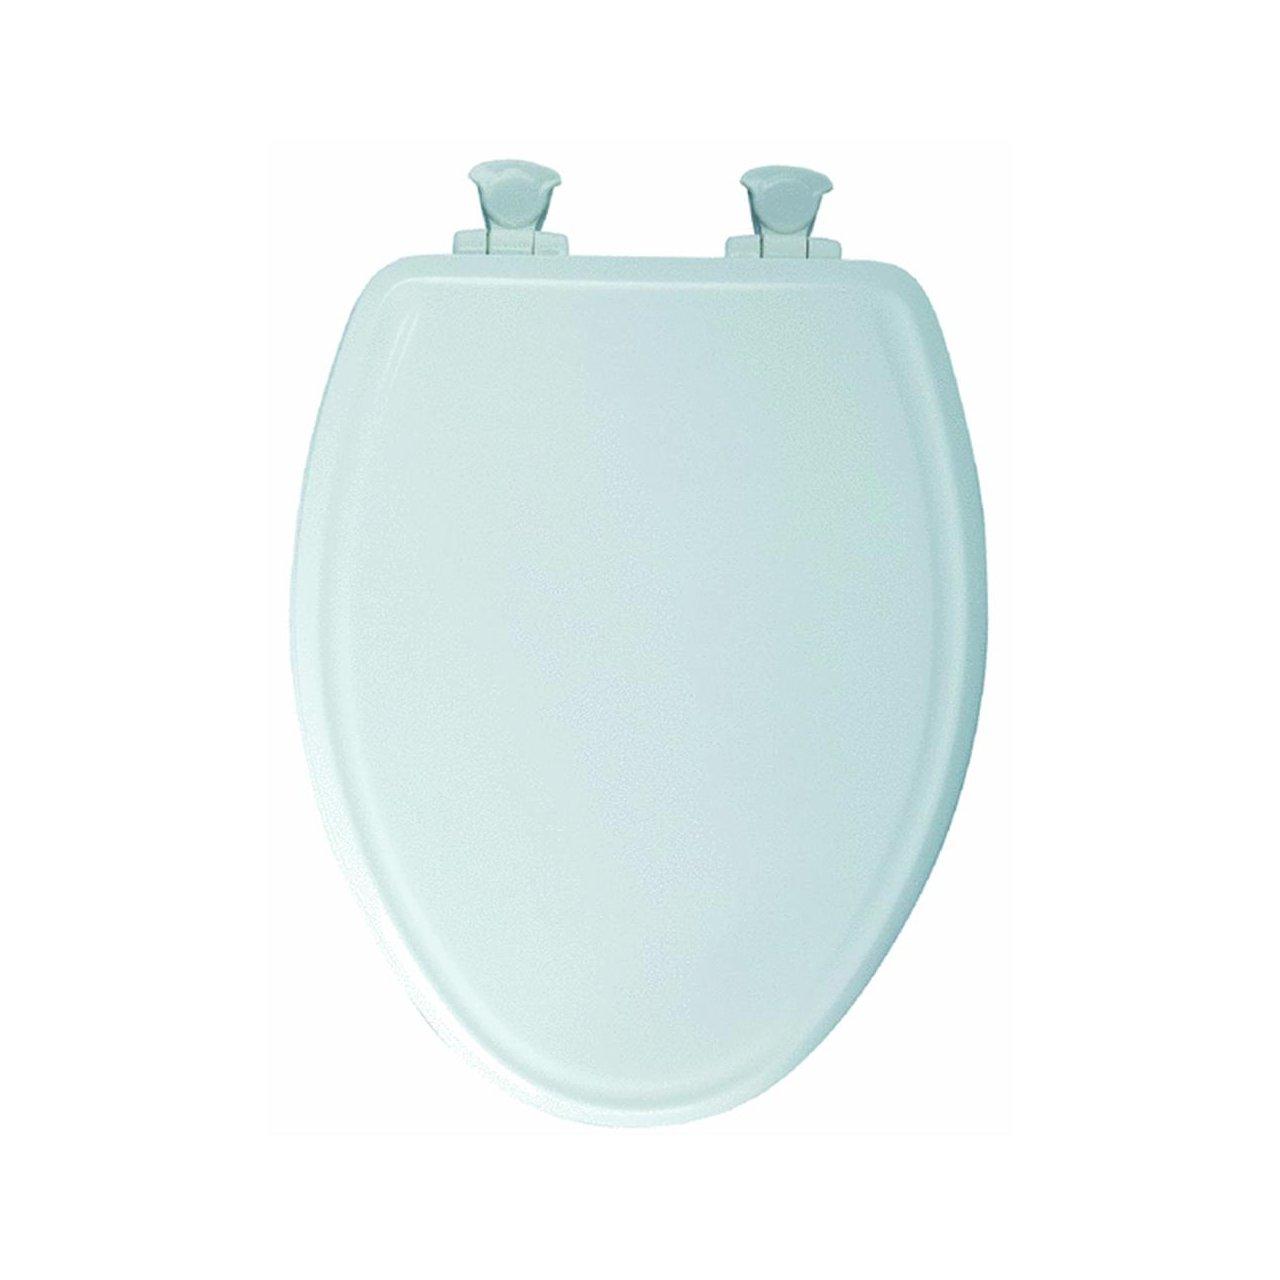 Mayfair 148SLOWA 000/1848SLOWA 000 Slow-Close Molded Wood Toilet Seat featuring Whisper-Close